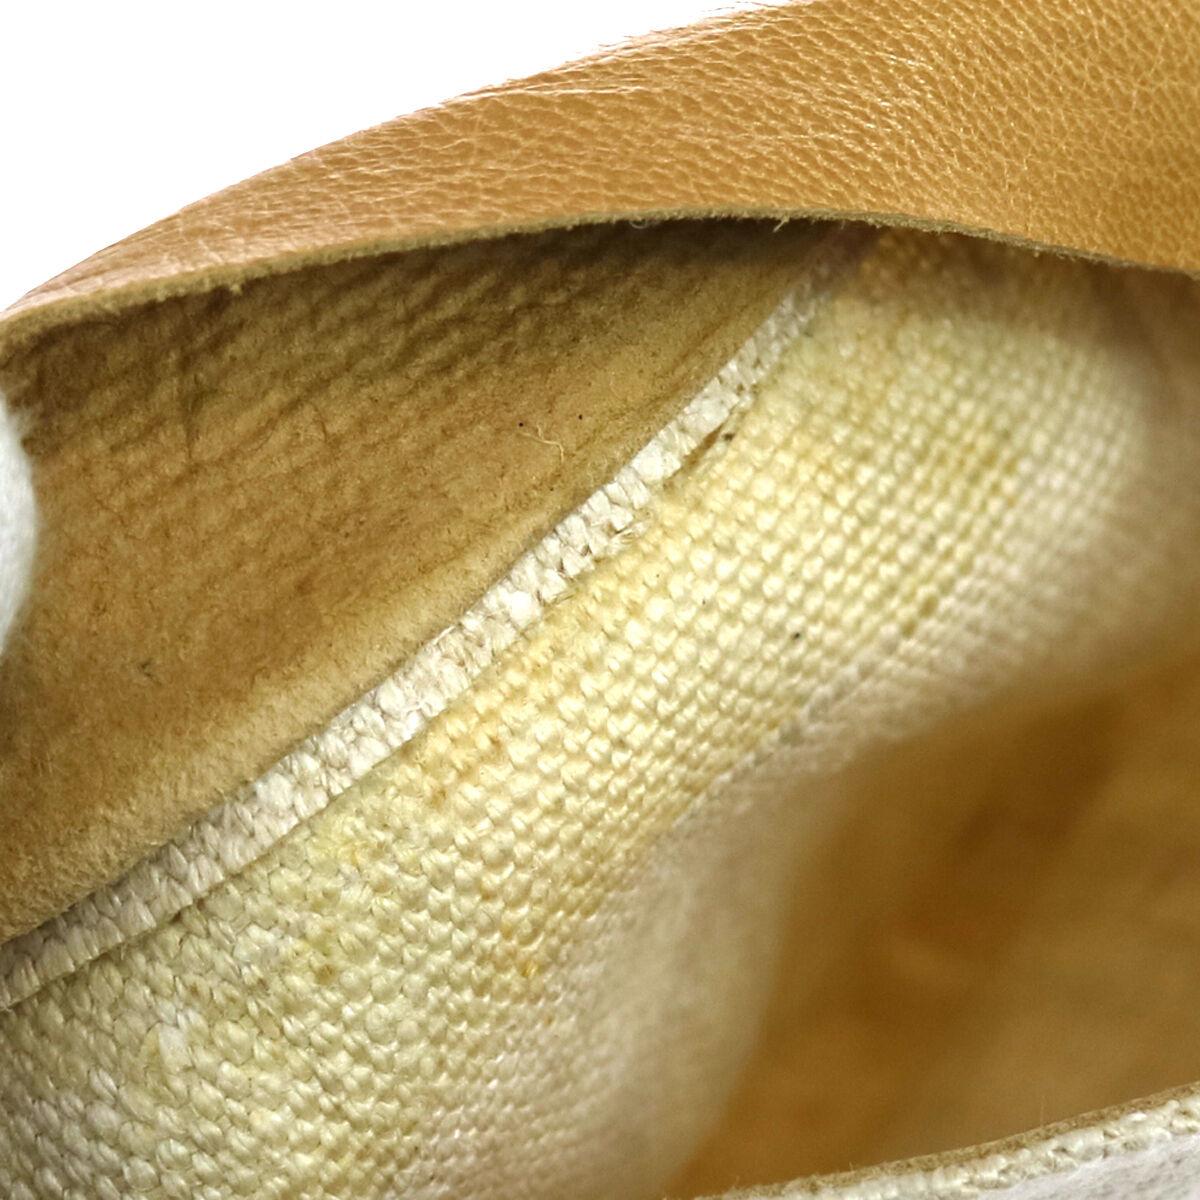 100% Authentic Canvas HERMES Logos schuhe Stiefel Weiß Canvas Authentic Vintage Größe 35 V06024 aa09f0